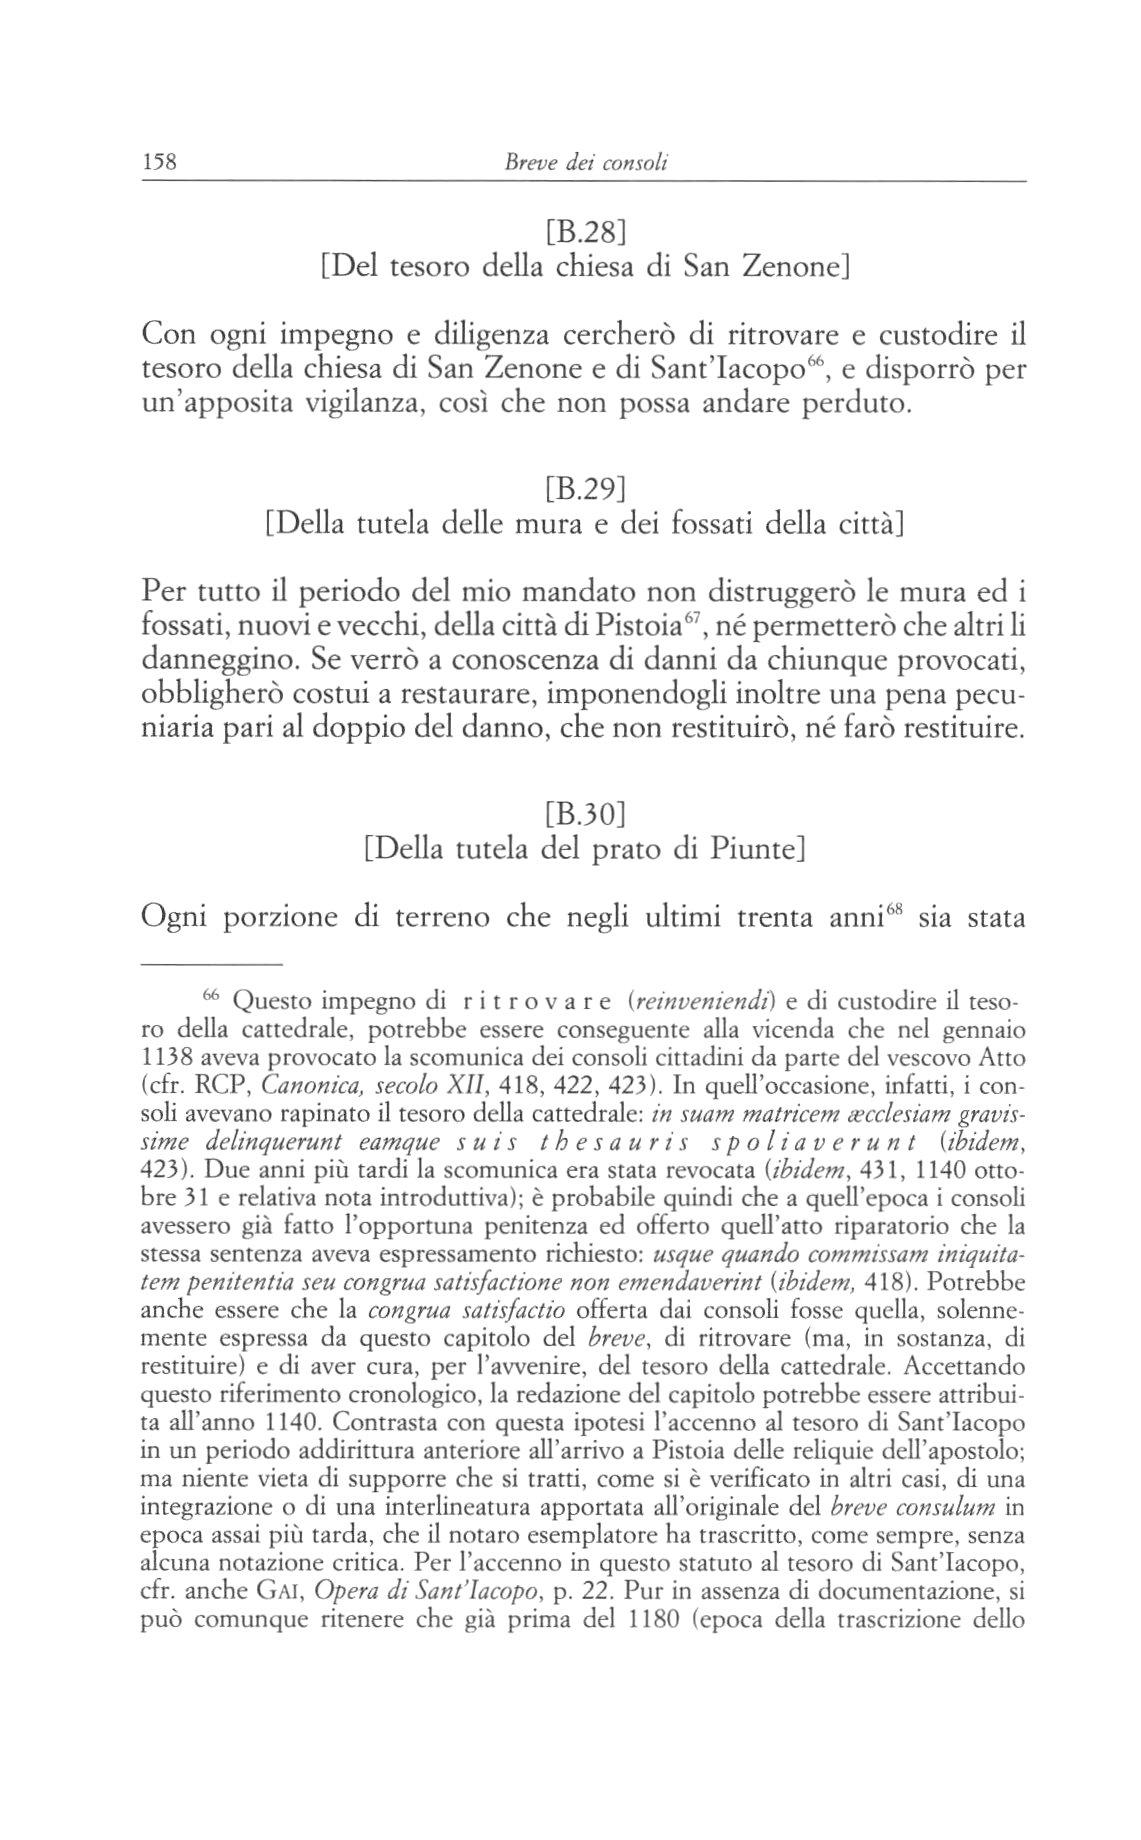 statuti pistoiesi del sec.XII 0158.jpg